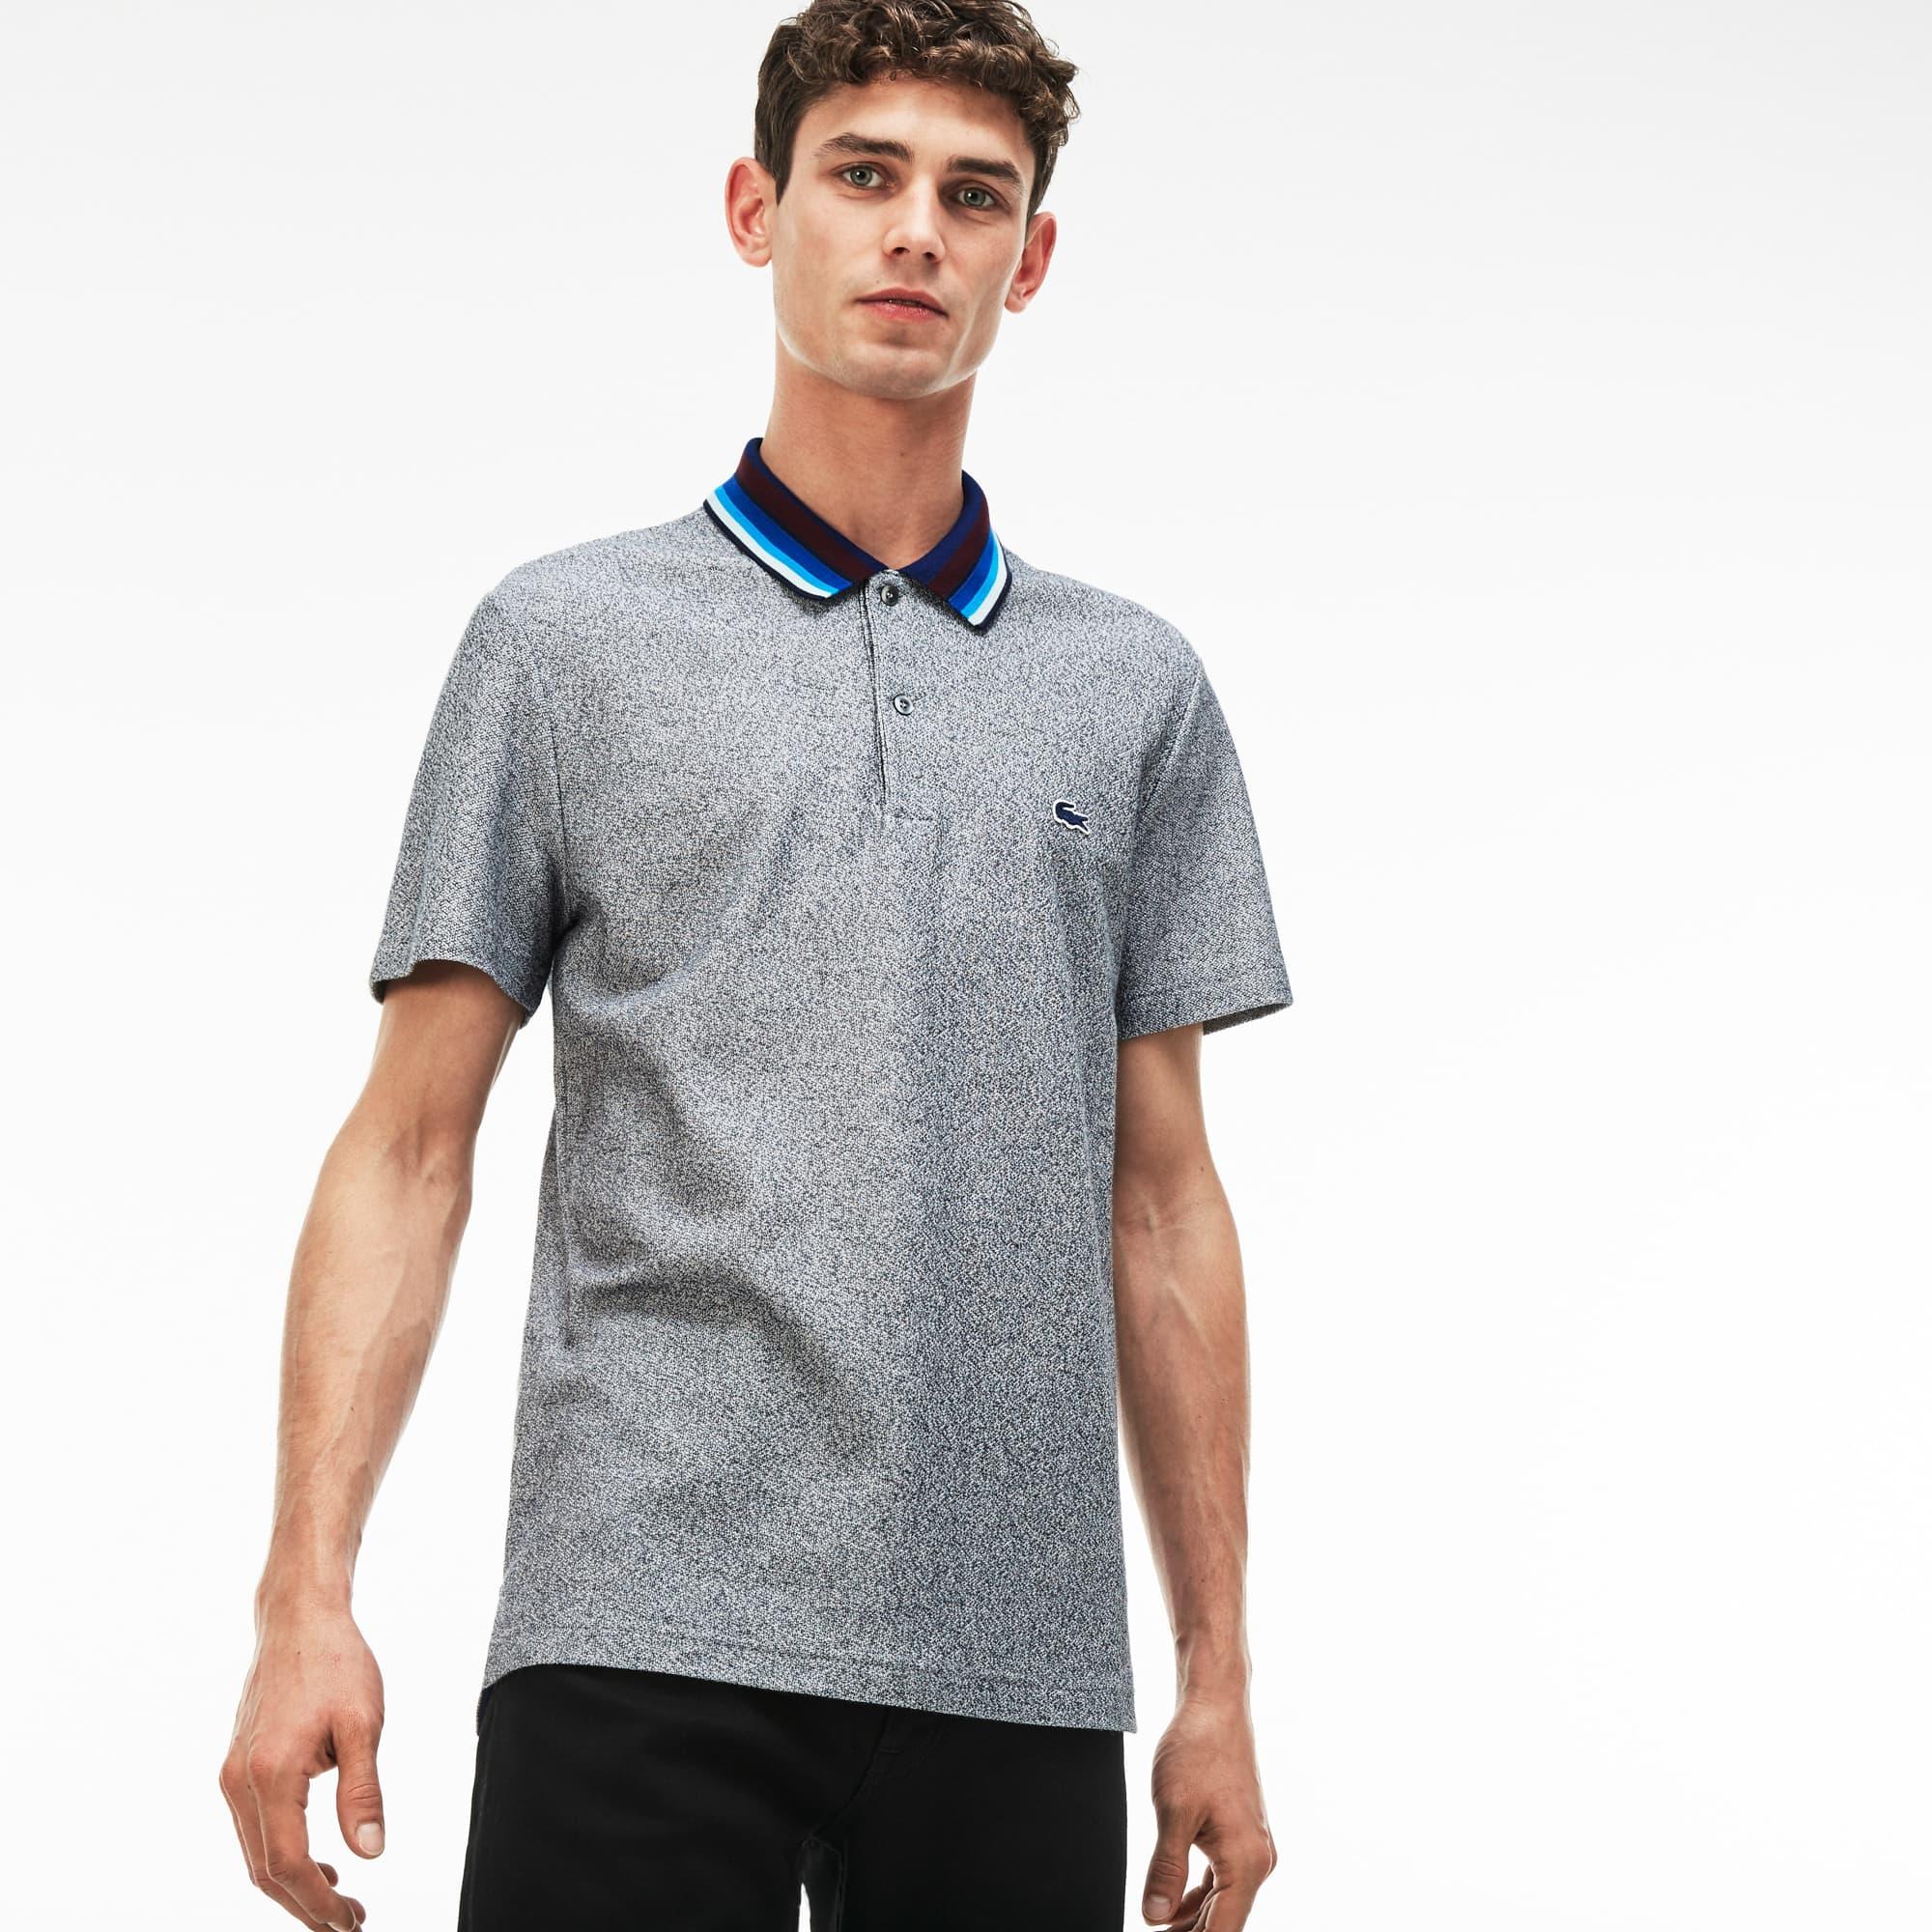 Men's Regular Fit Piped Cotton Piqué Polo